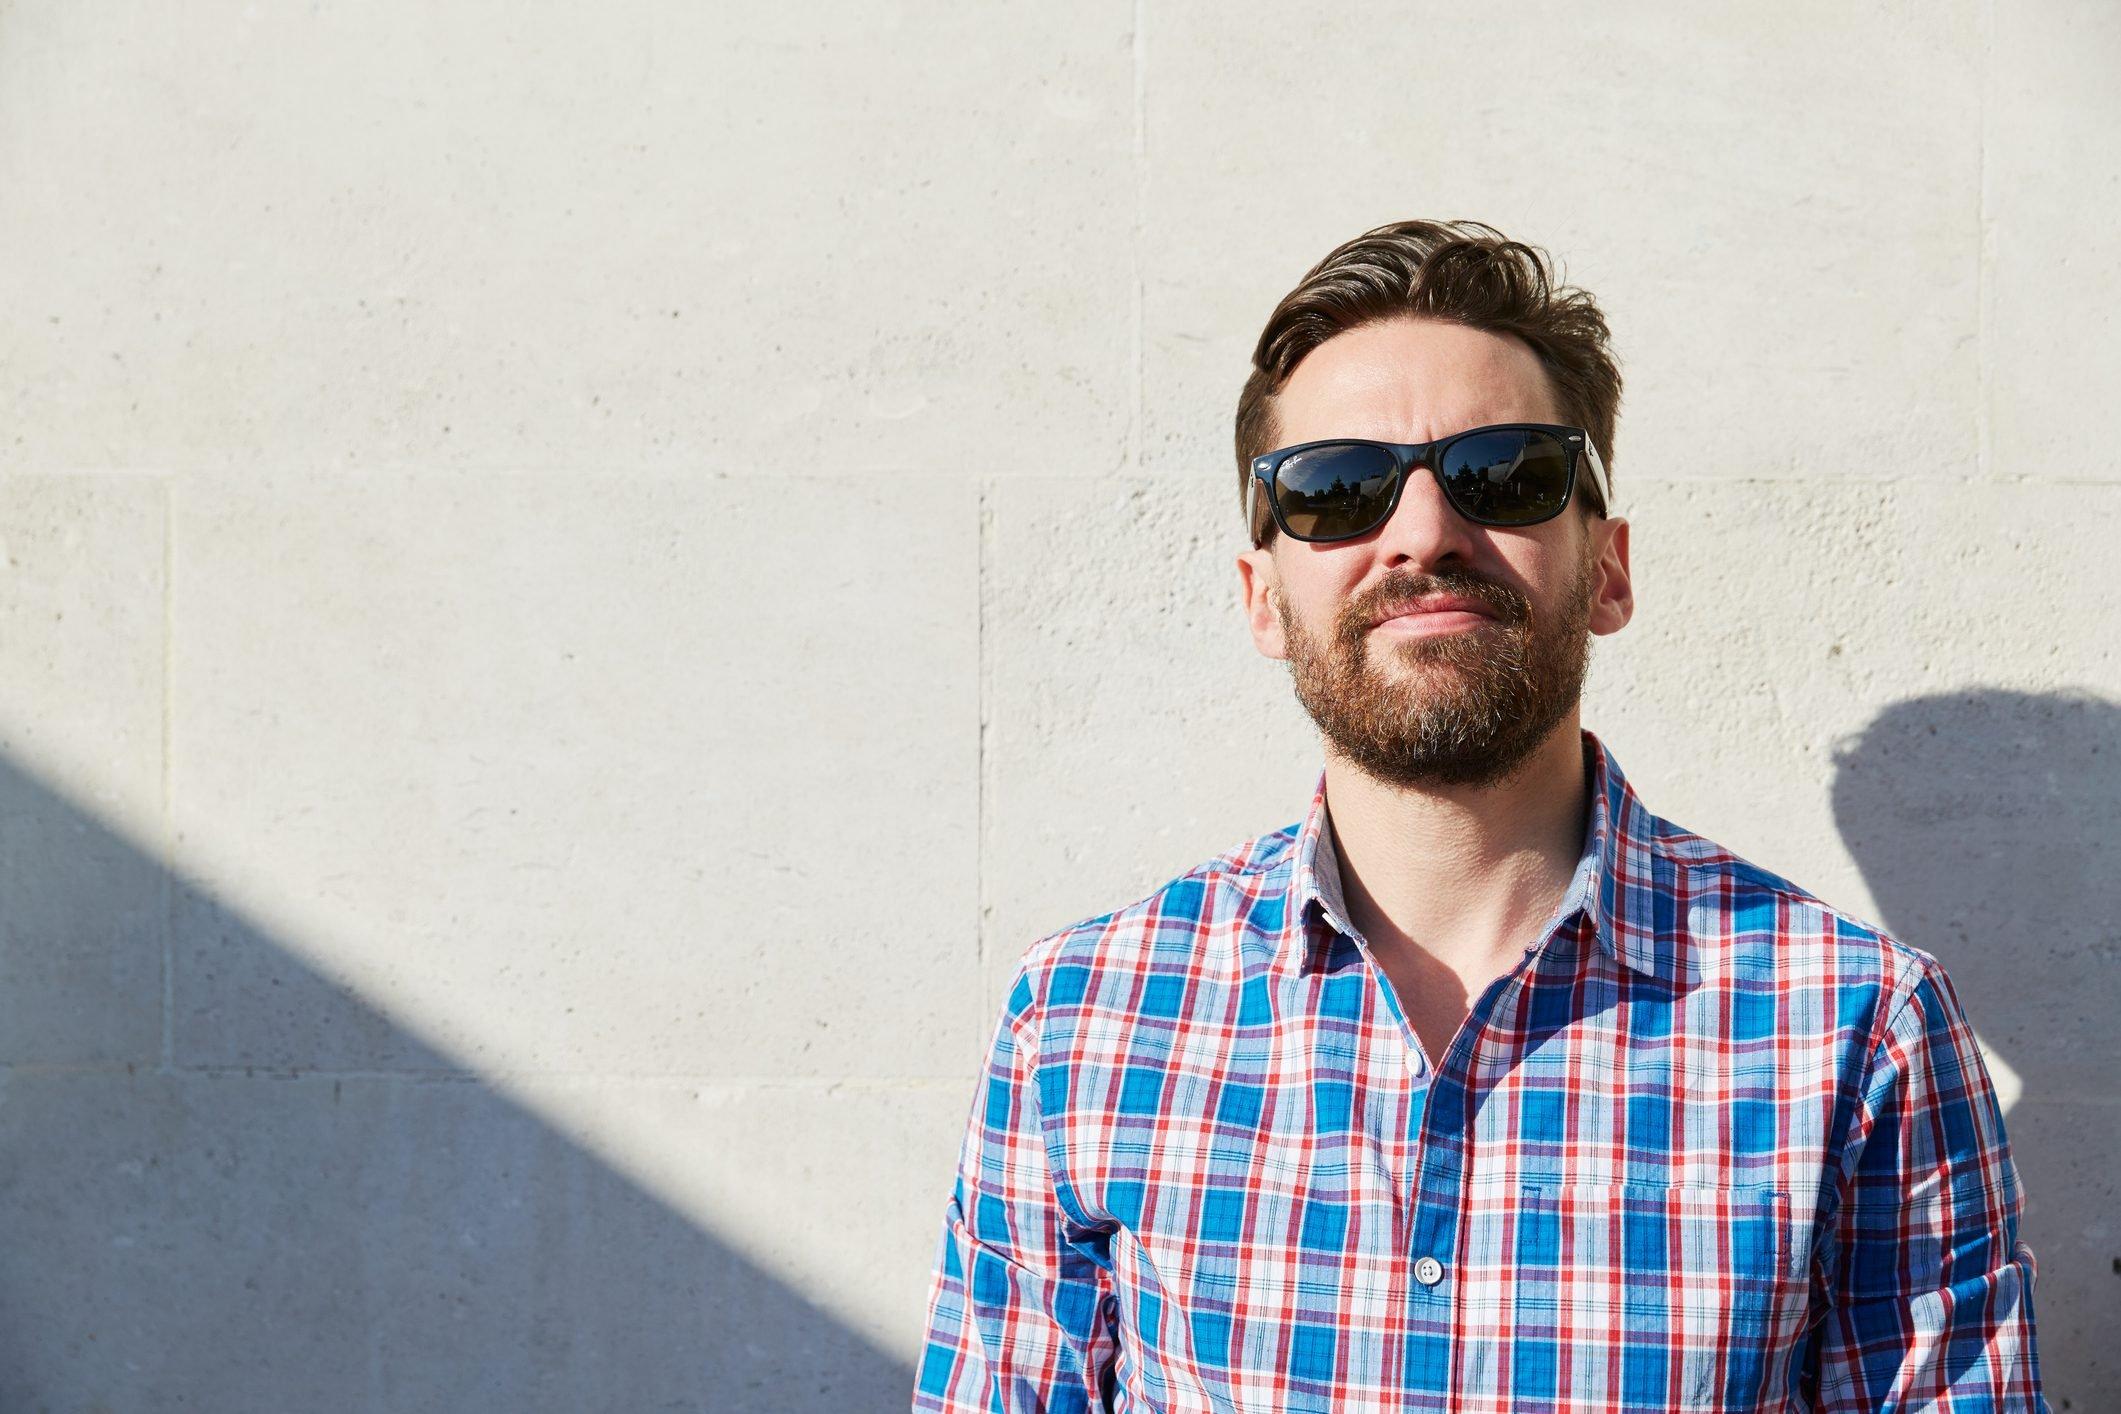 man wearing sunglasses in the sunshine